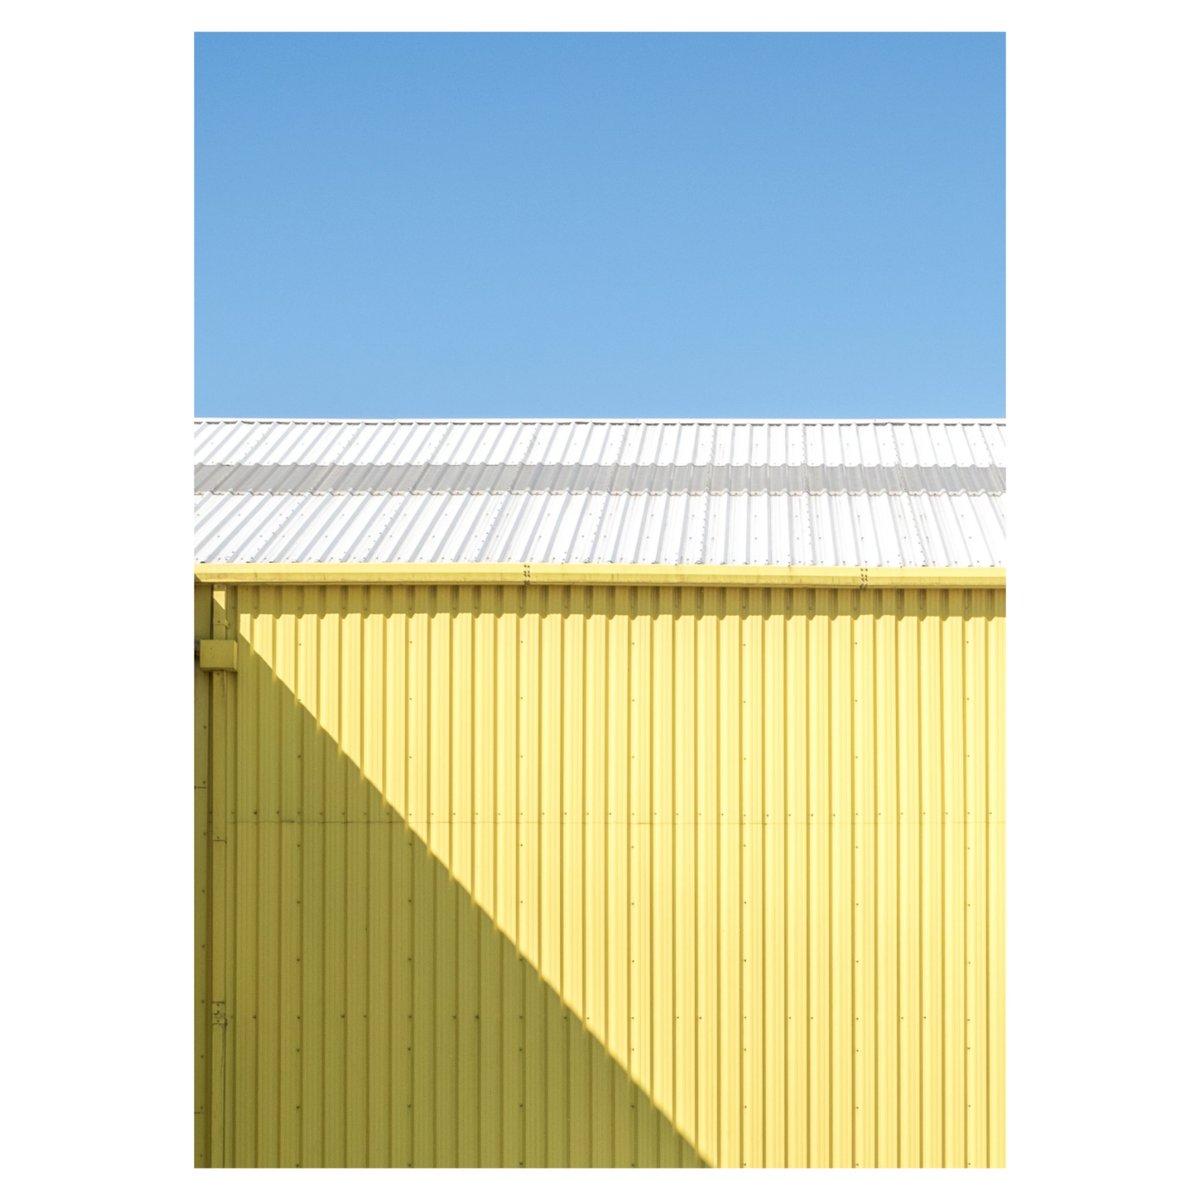 Yellow  #minimal #photography #light #fujifeed #fujifilm @FujifilmX_UK #yellow #super_ordinarylife pic.twitter.com/d5BMWj1hov